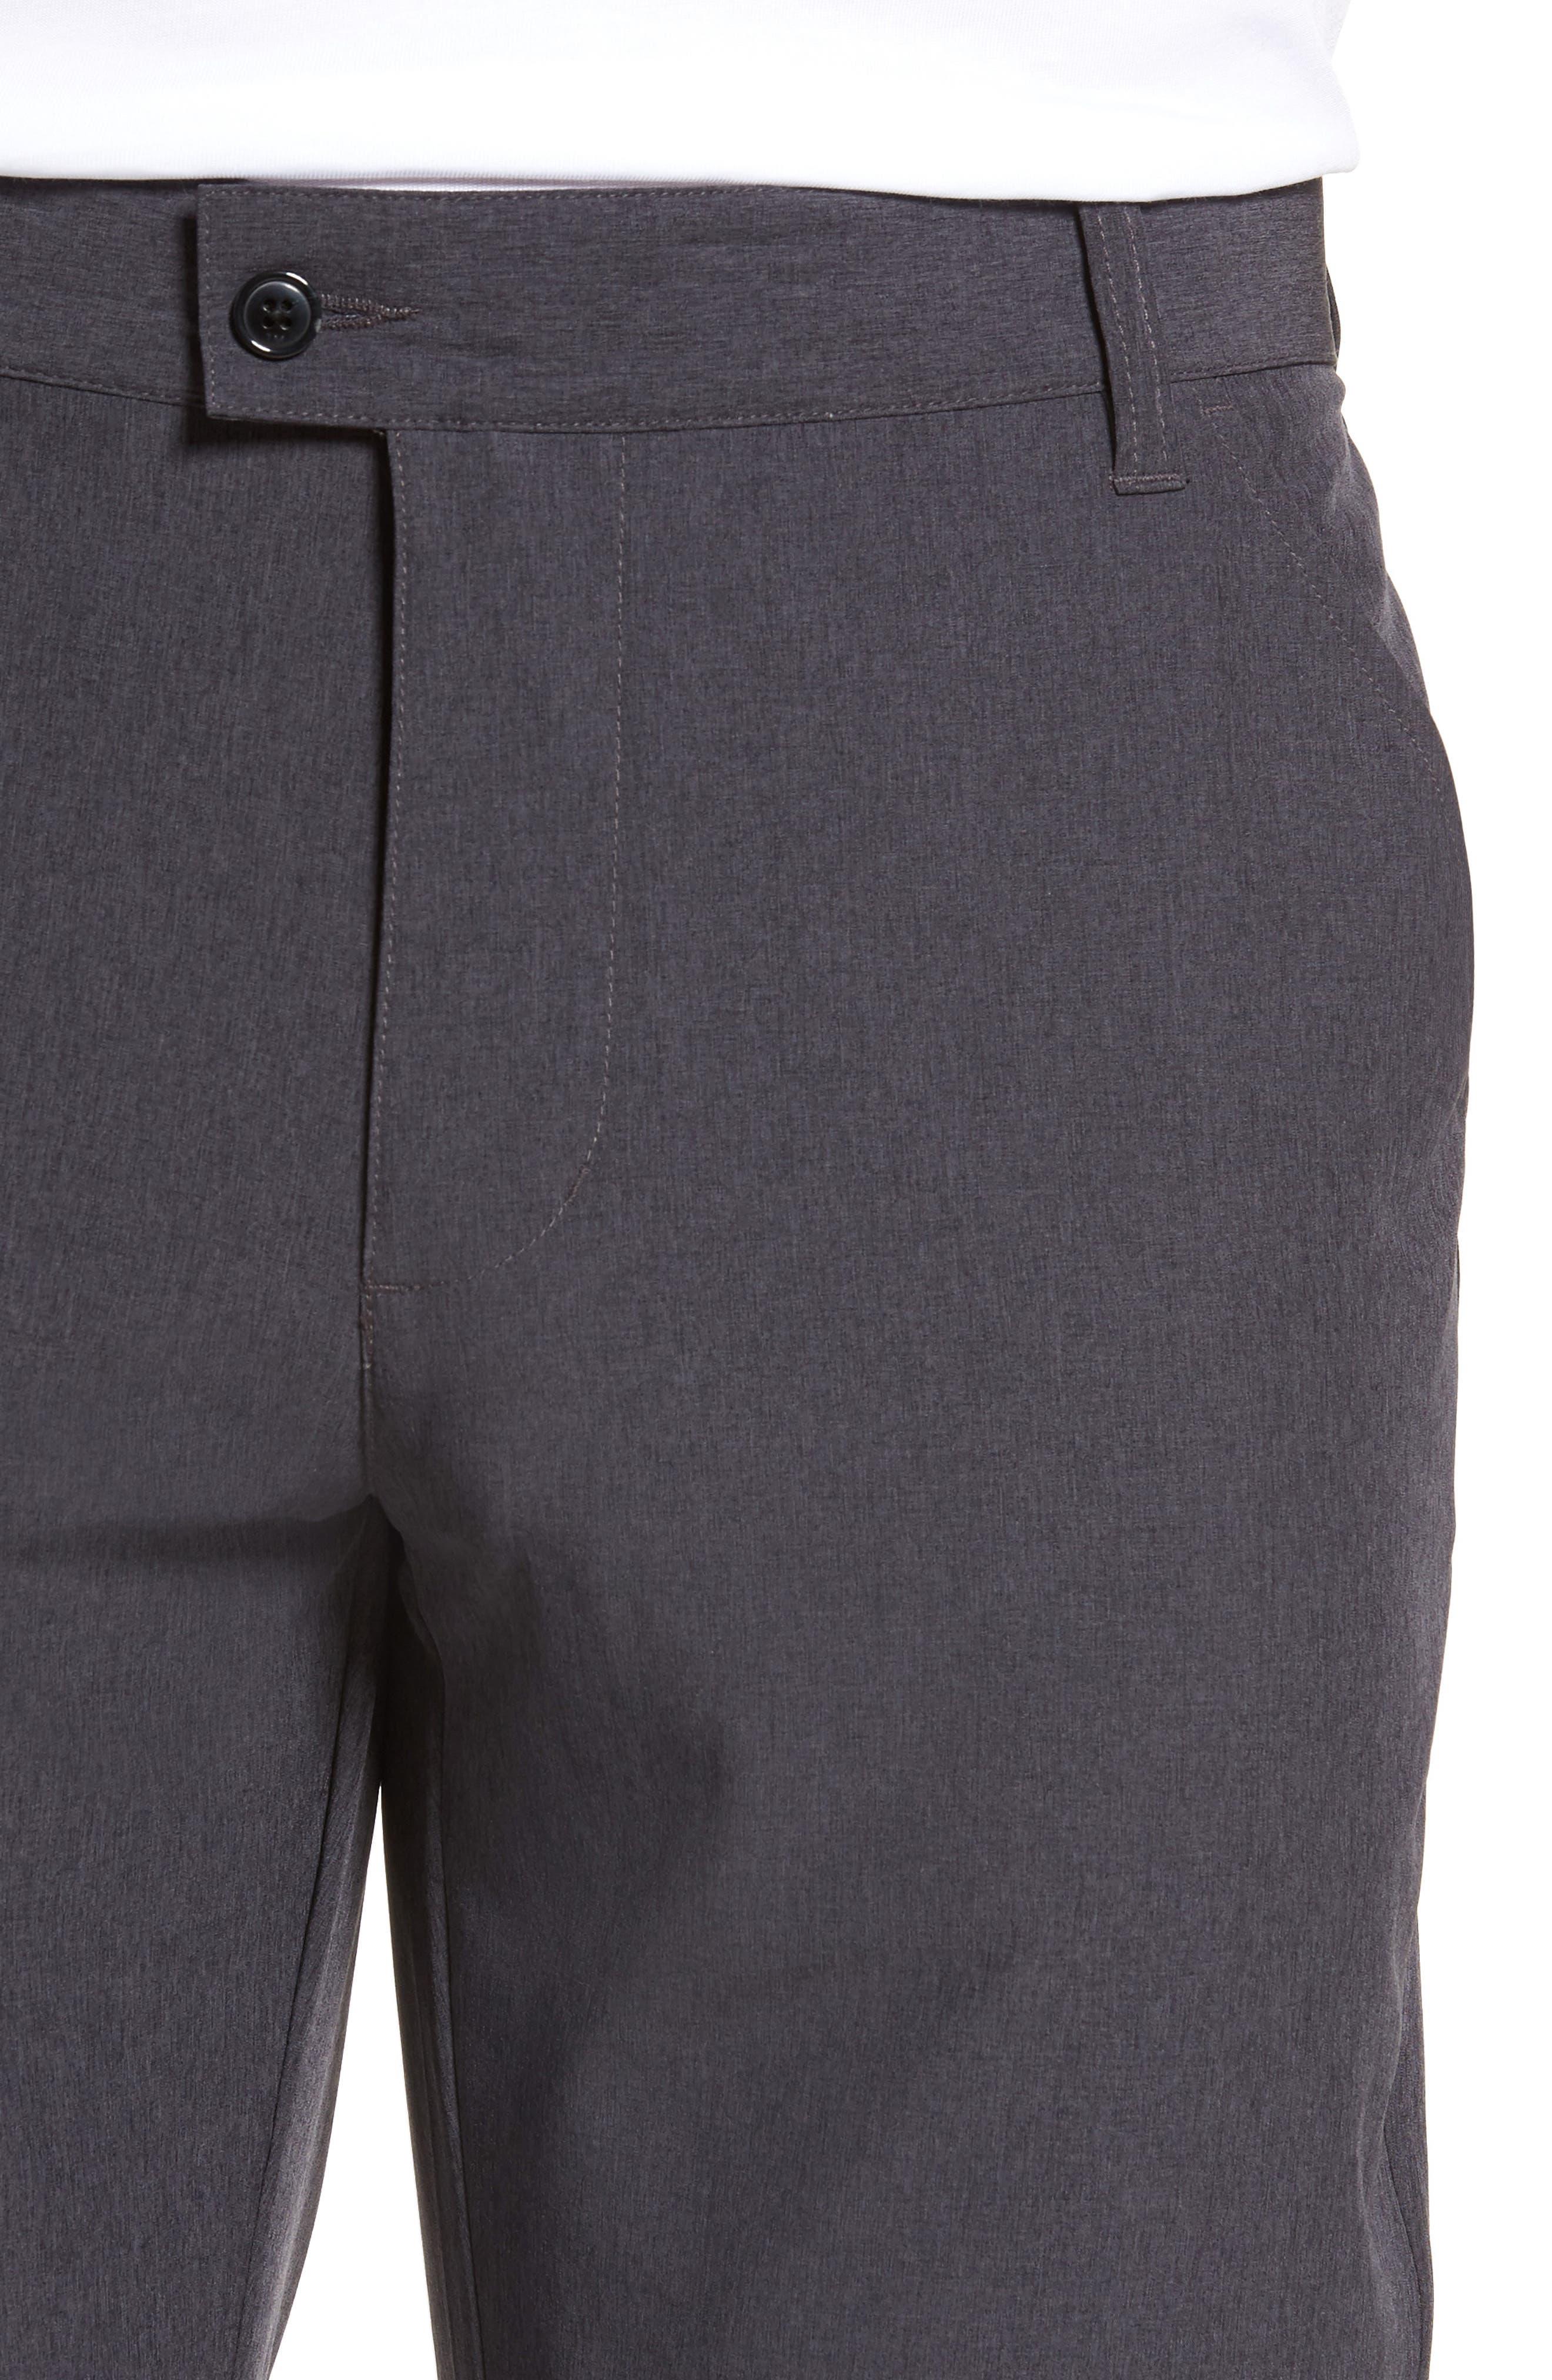 TRAVISMATHEW, Pantladdium Pants, Alternate thumbnail 4, color, HEATHER BLACK